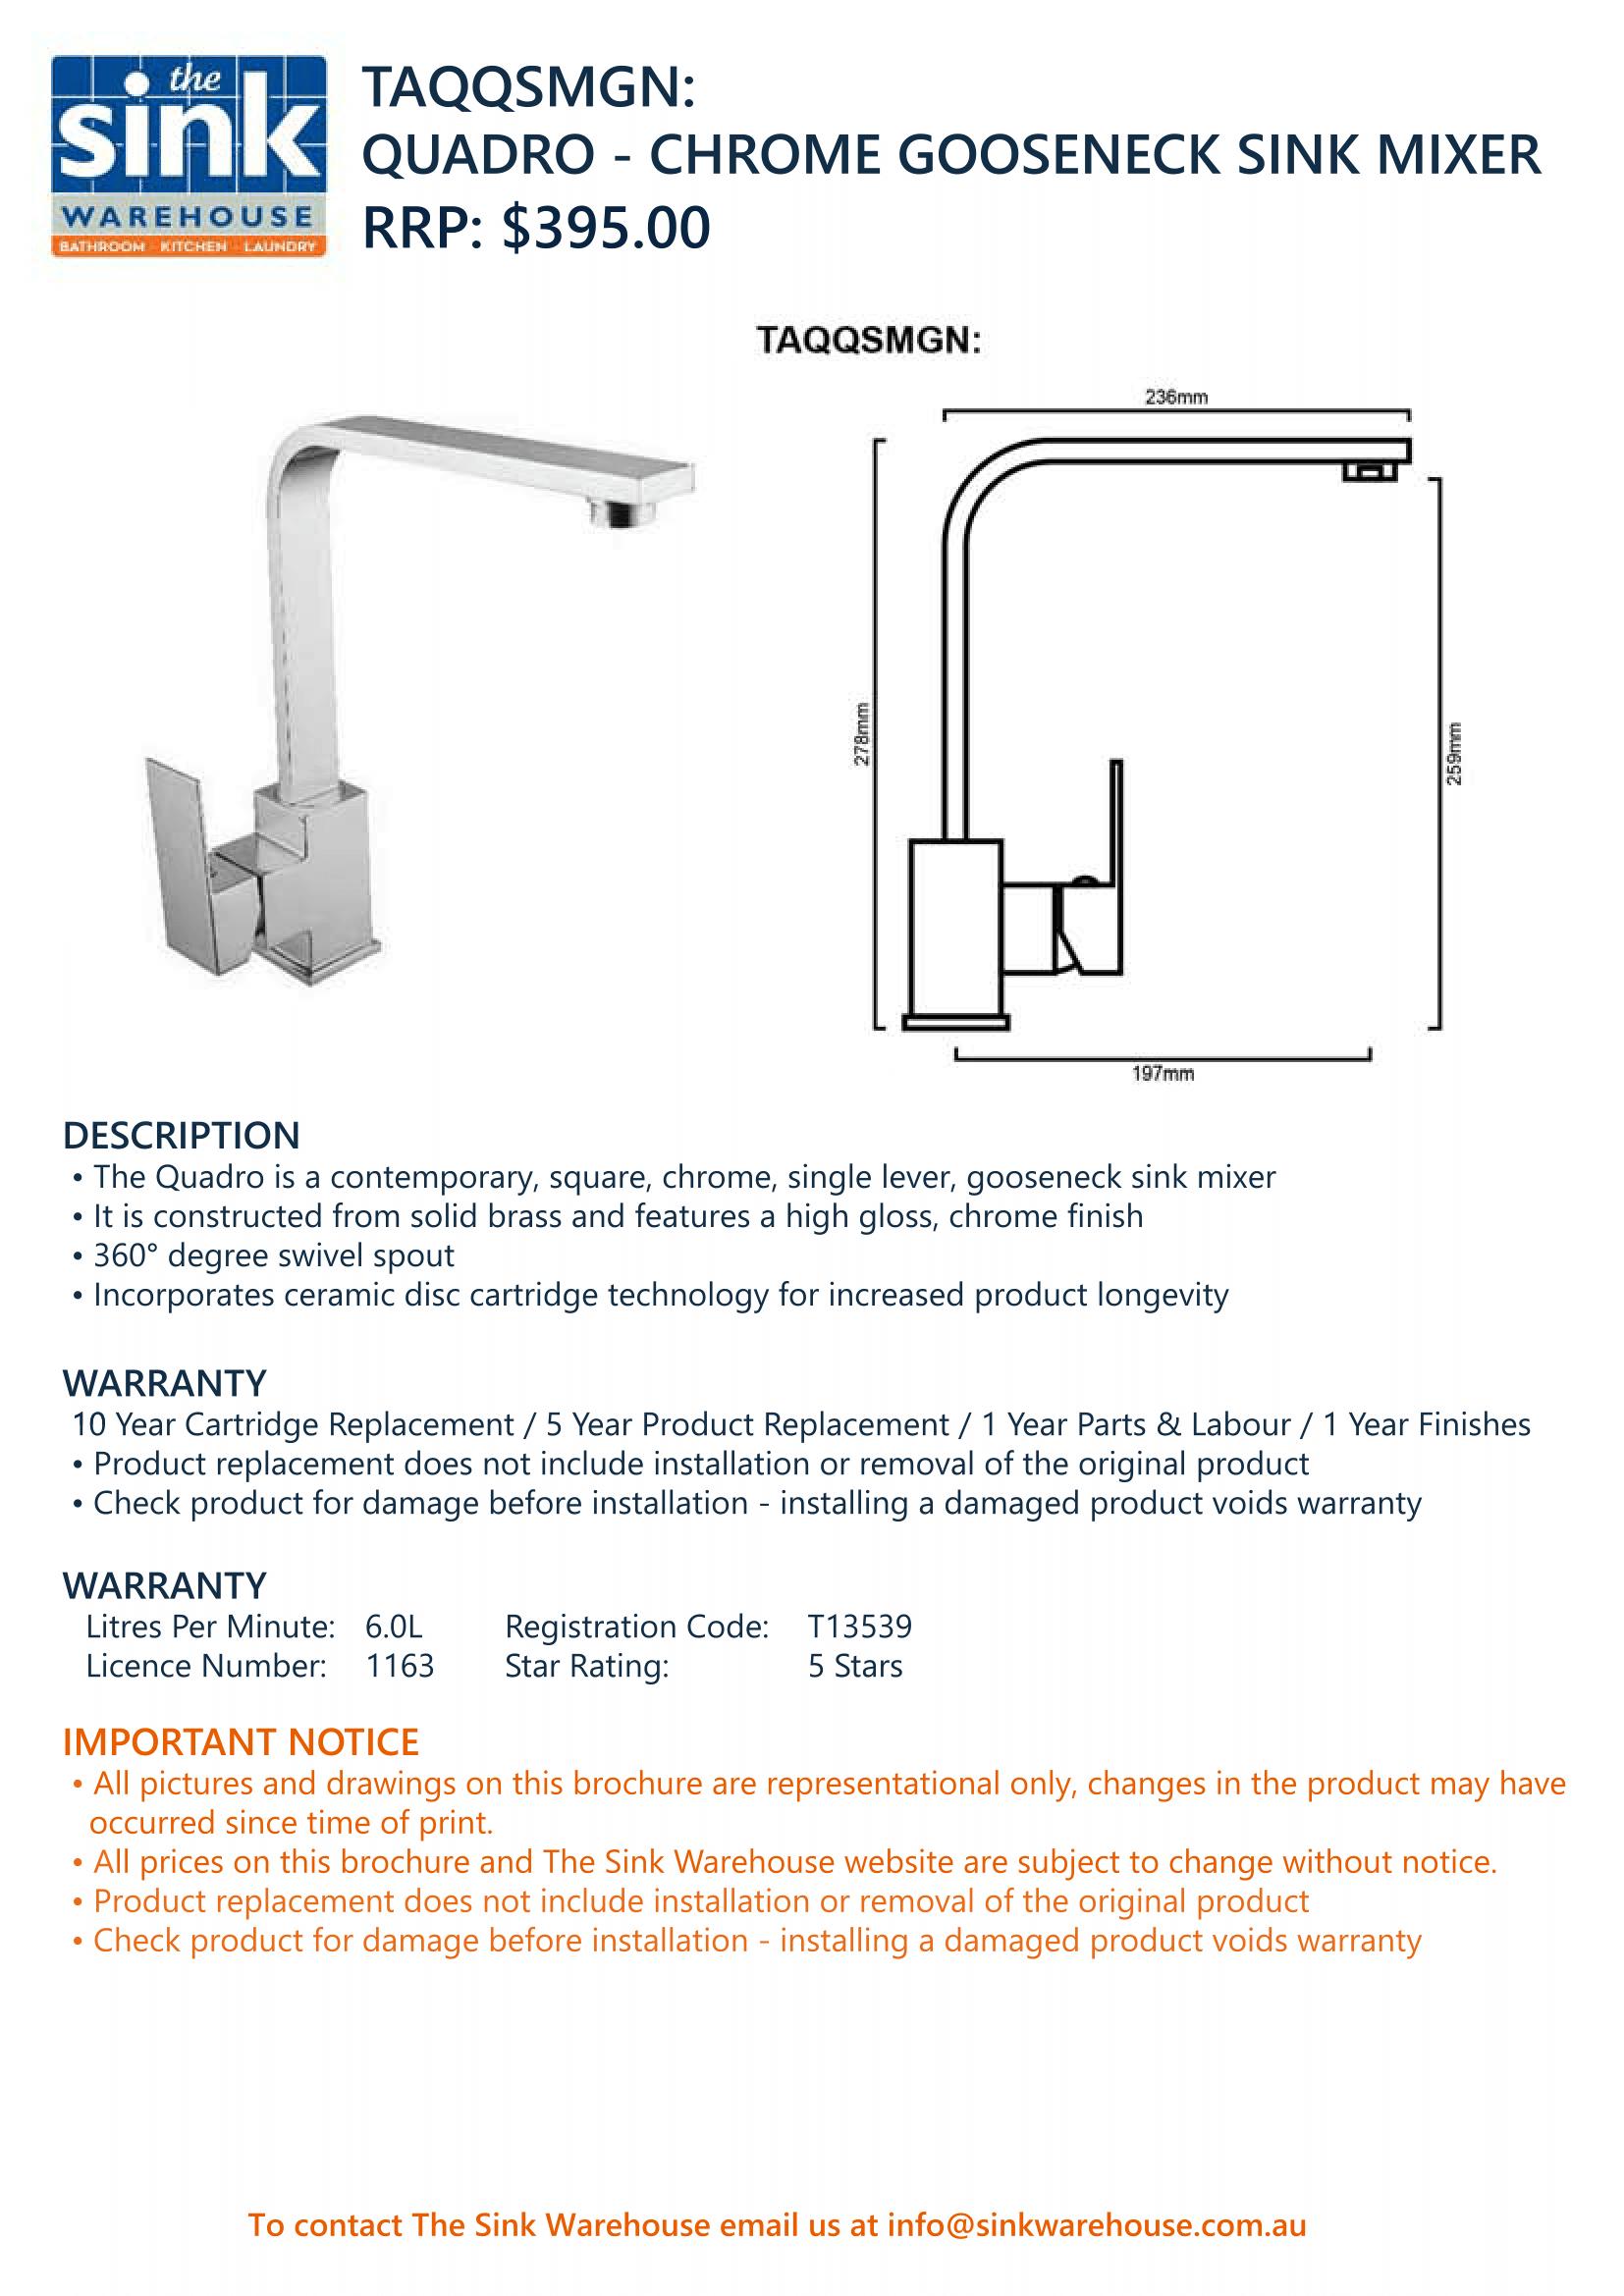 taqqsmgn-product-spec-sheet-1.png